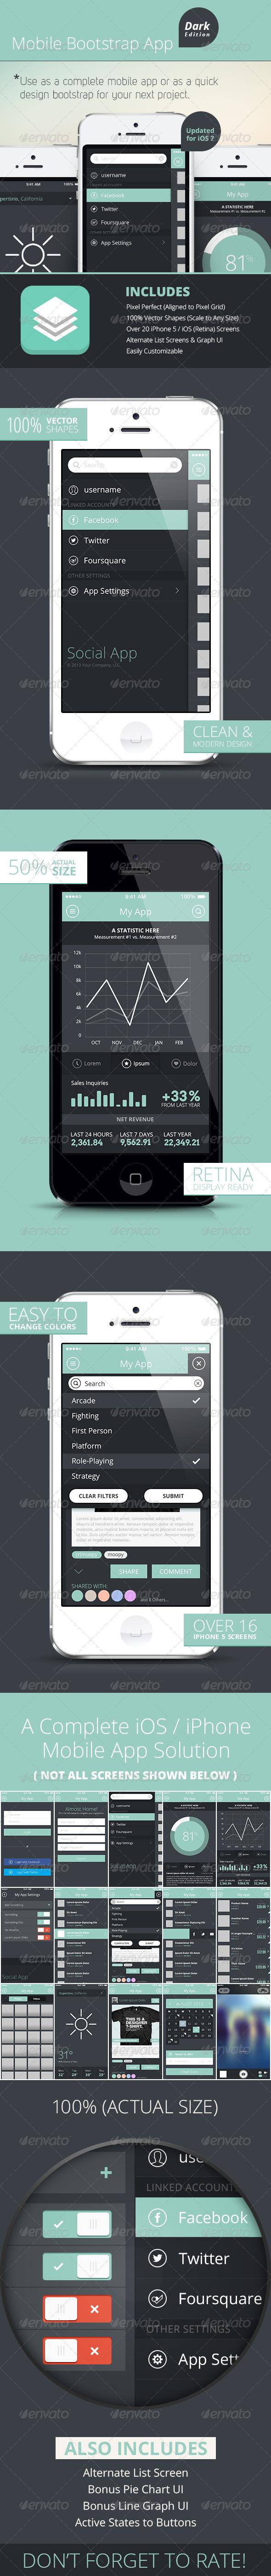 GraphicRiver Bootstrap Mobile Phone UI iPhone iOS App Dark 5167300